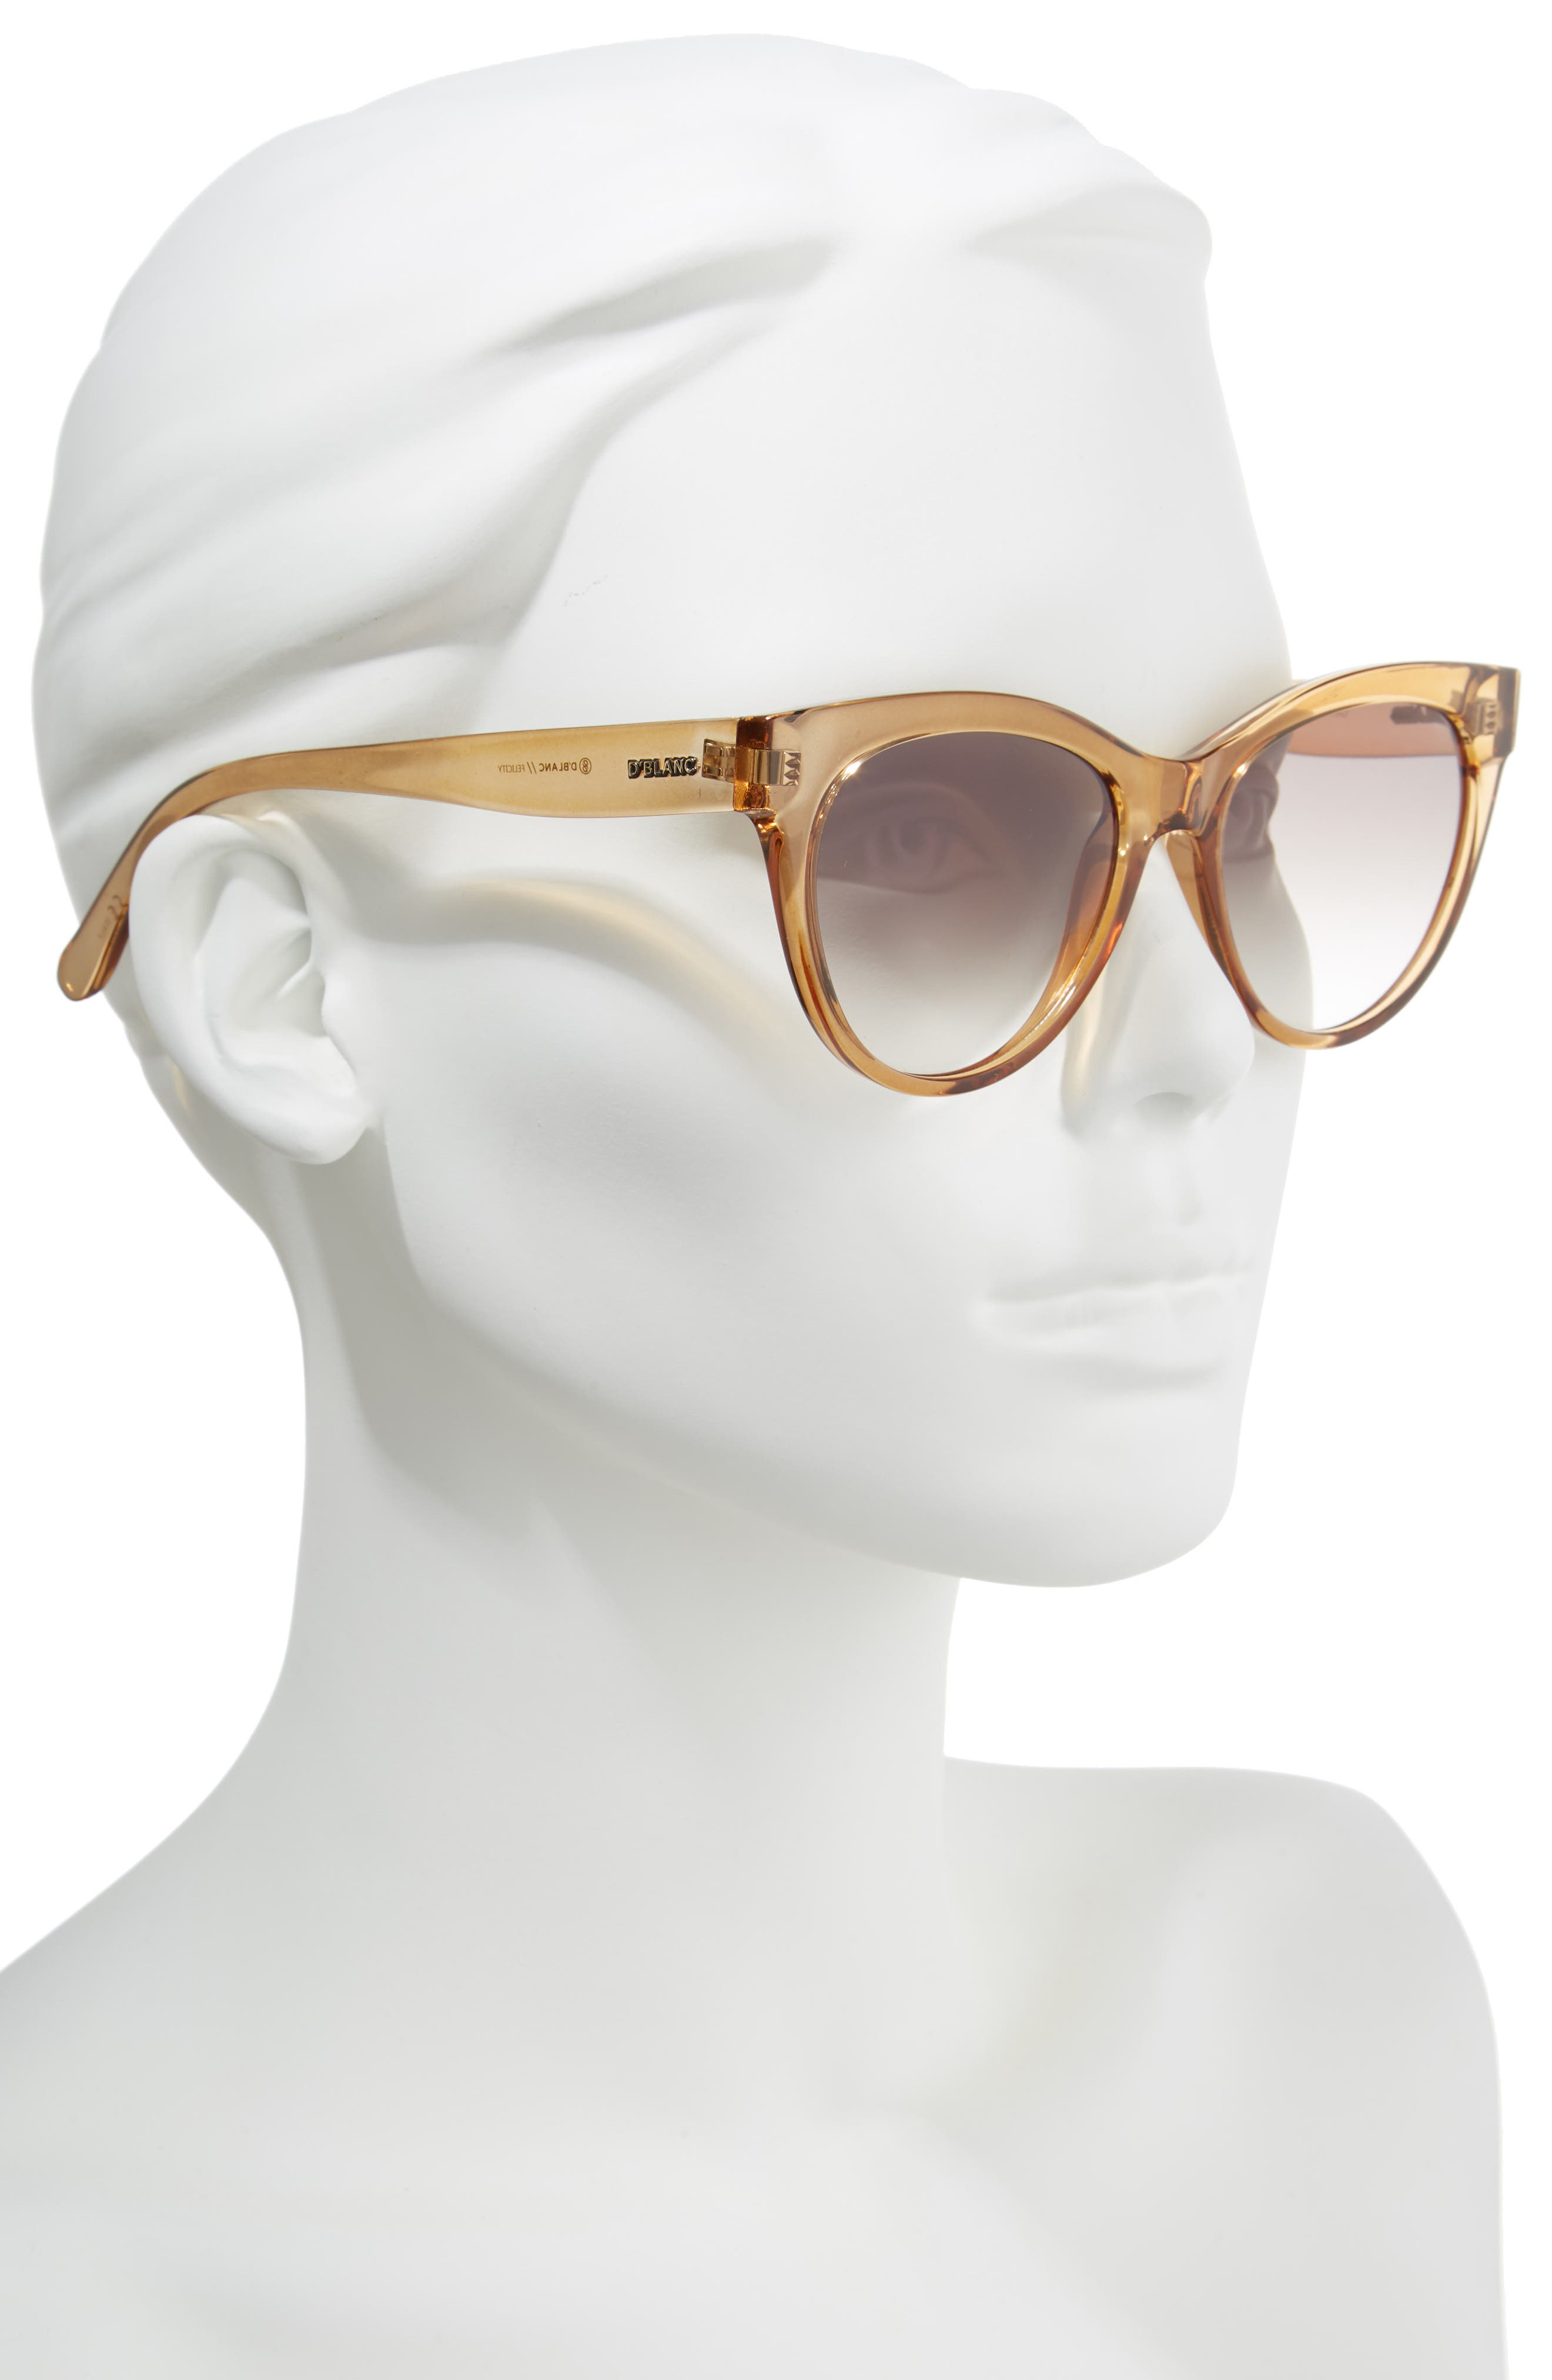 D'BLANC Felicity 54mm Cat Eye Sunglasses,                             Alternate thumbnail 2, color,                             Chai Gloss